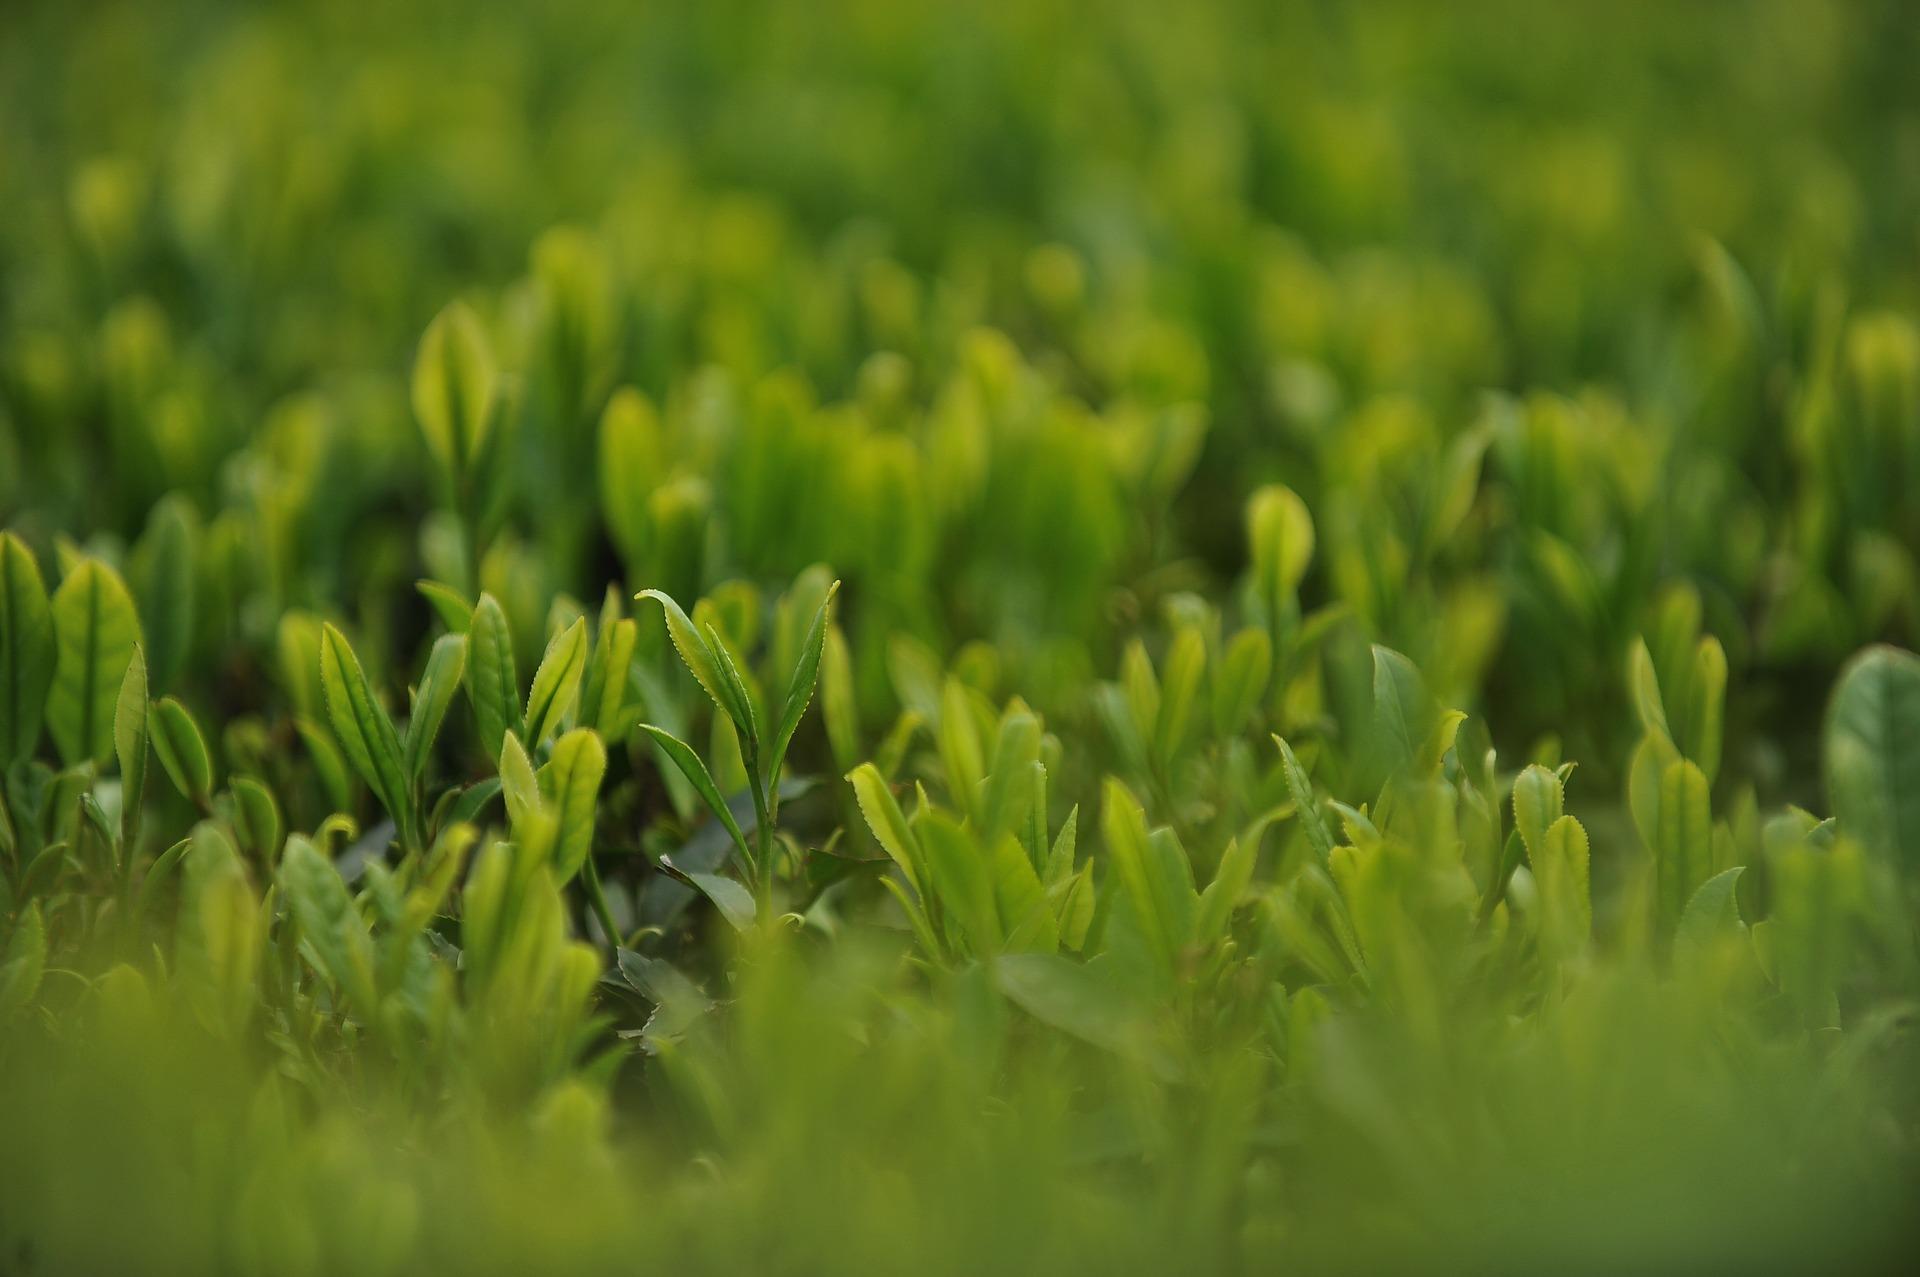 http://kouraininjins.info/images/tea-garden-1557700_1920.jpg